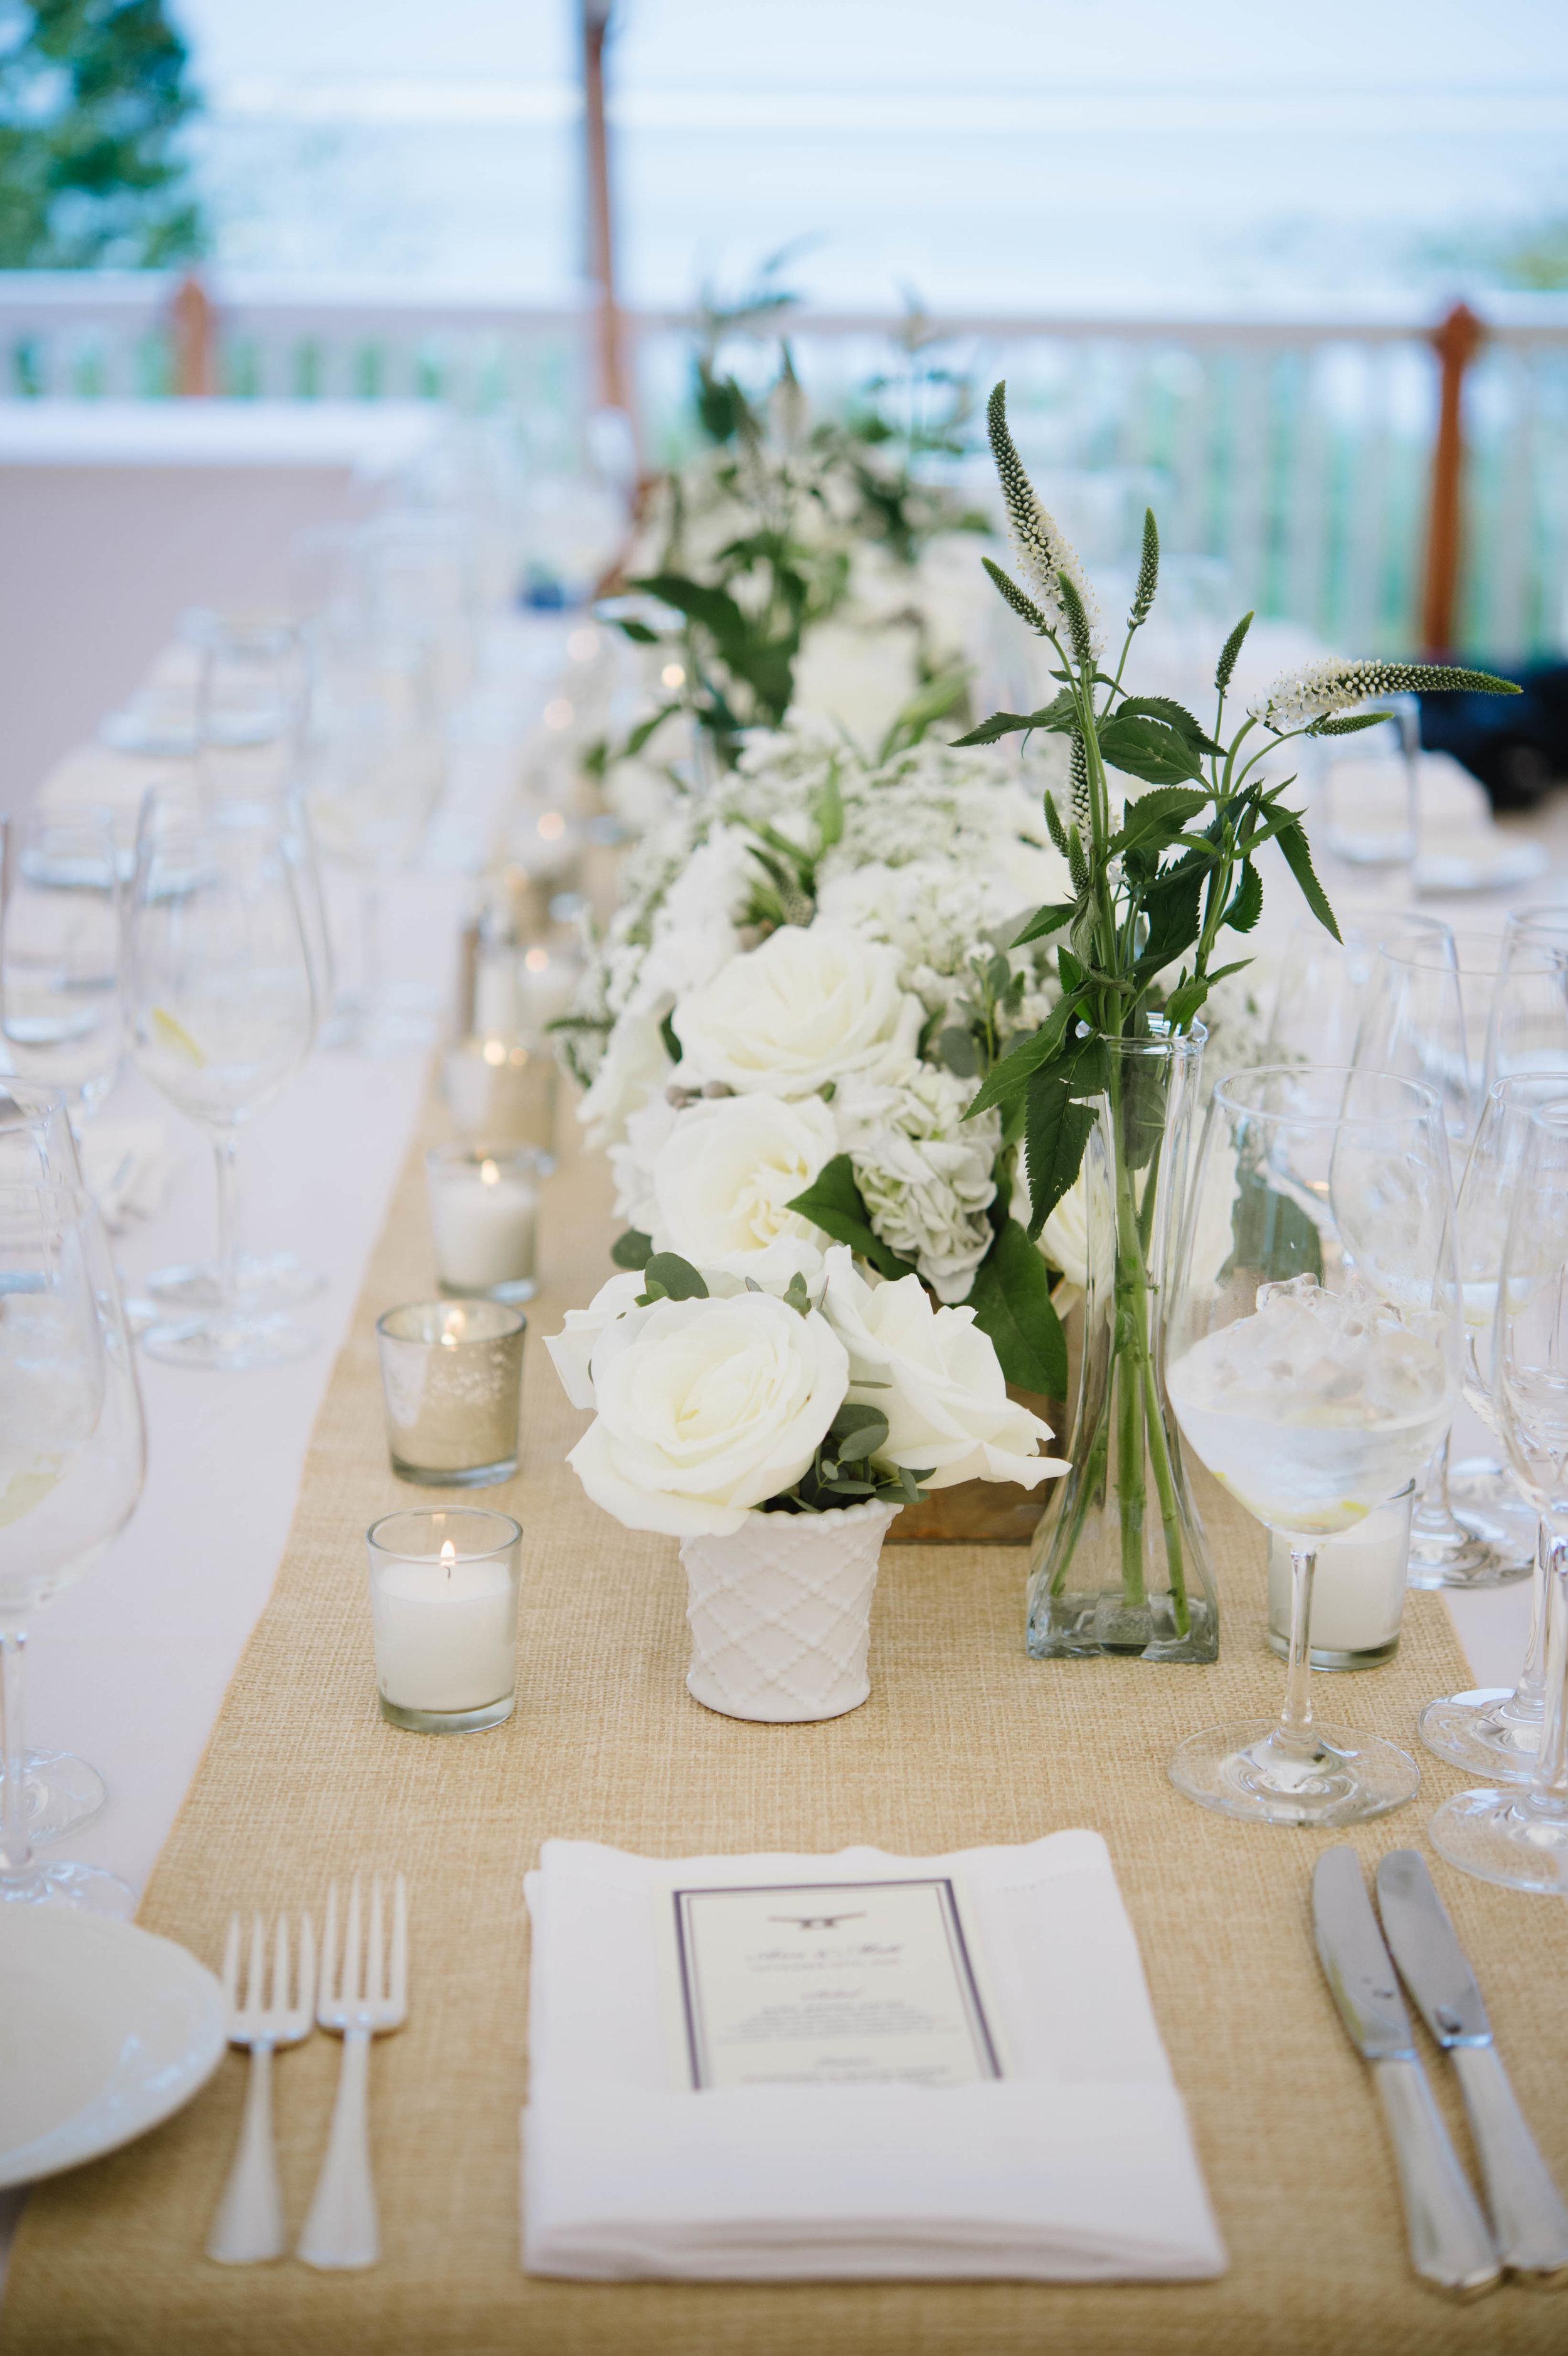 Candid-Wedding-Photography021.jpg